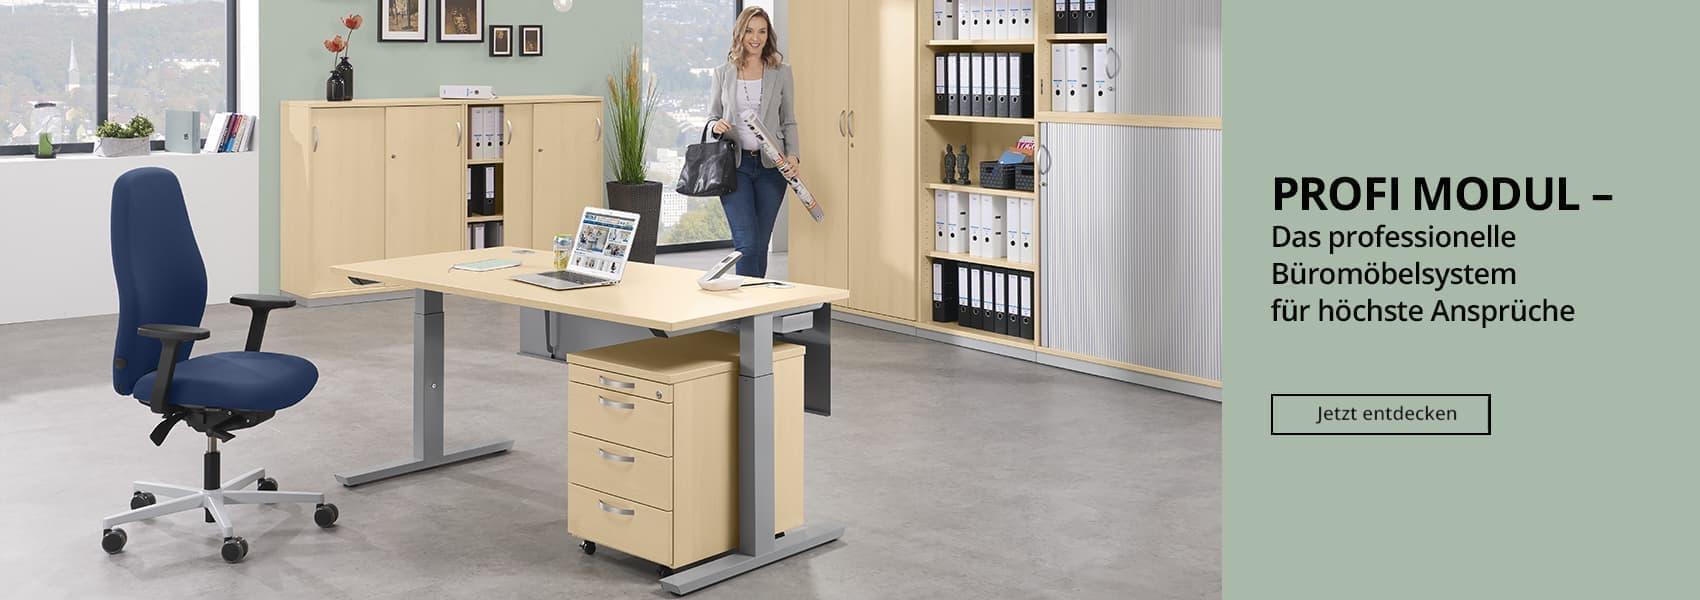 Büromöbelsystem PROFI MODUL